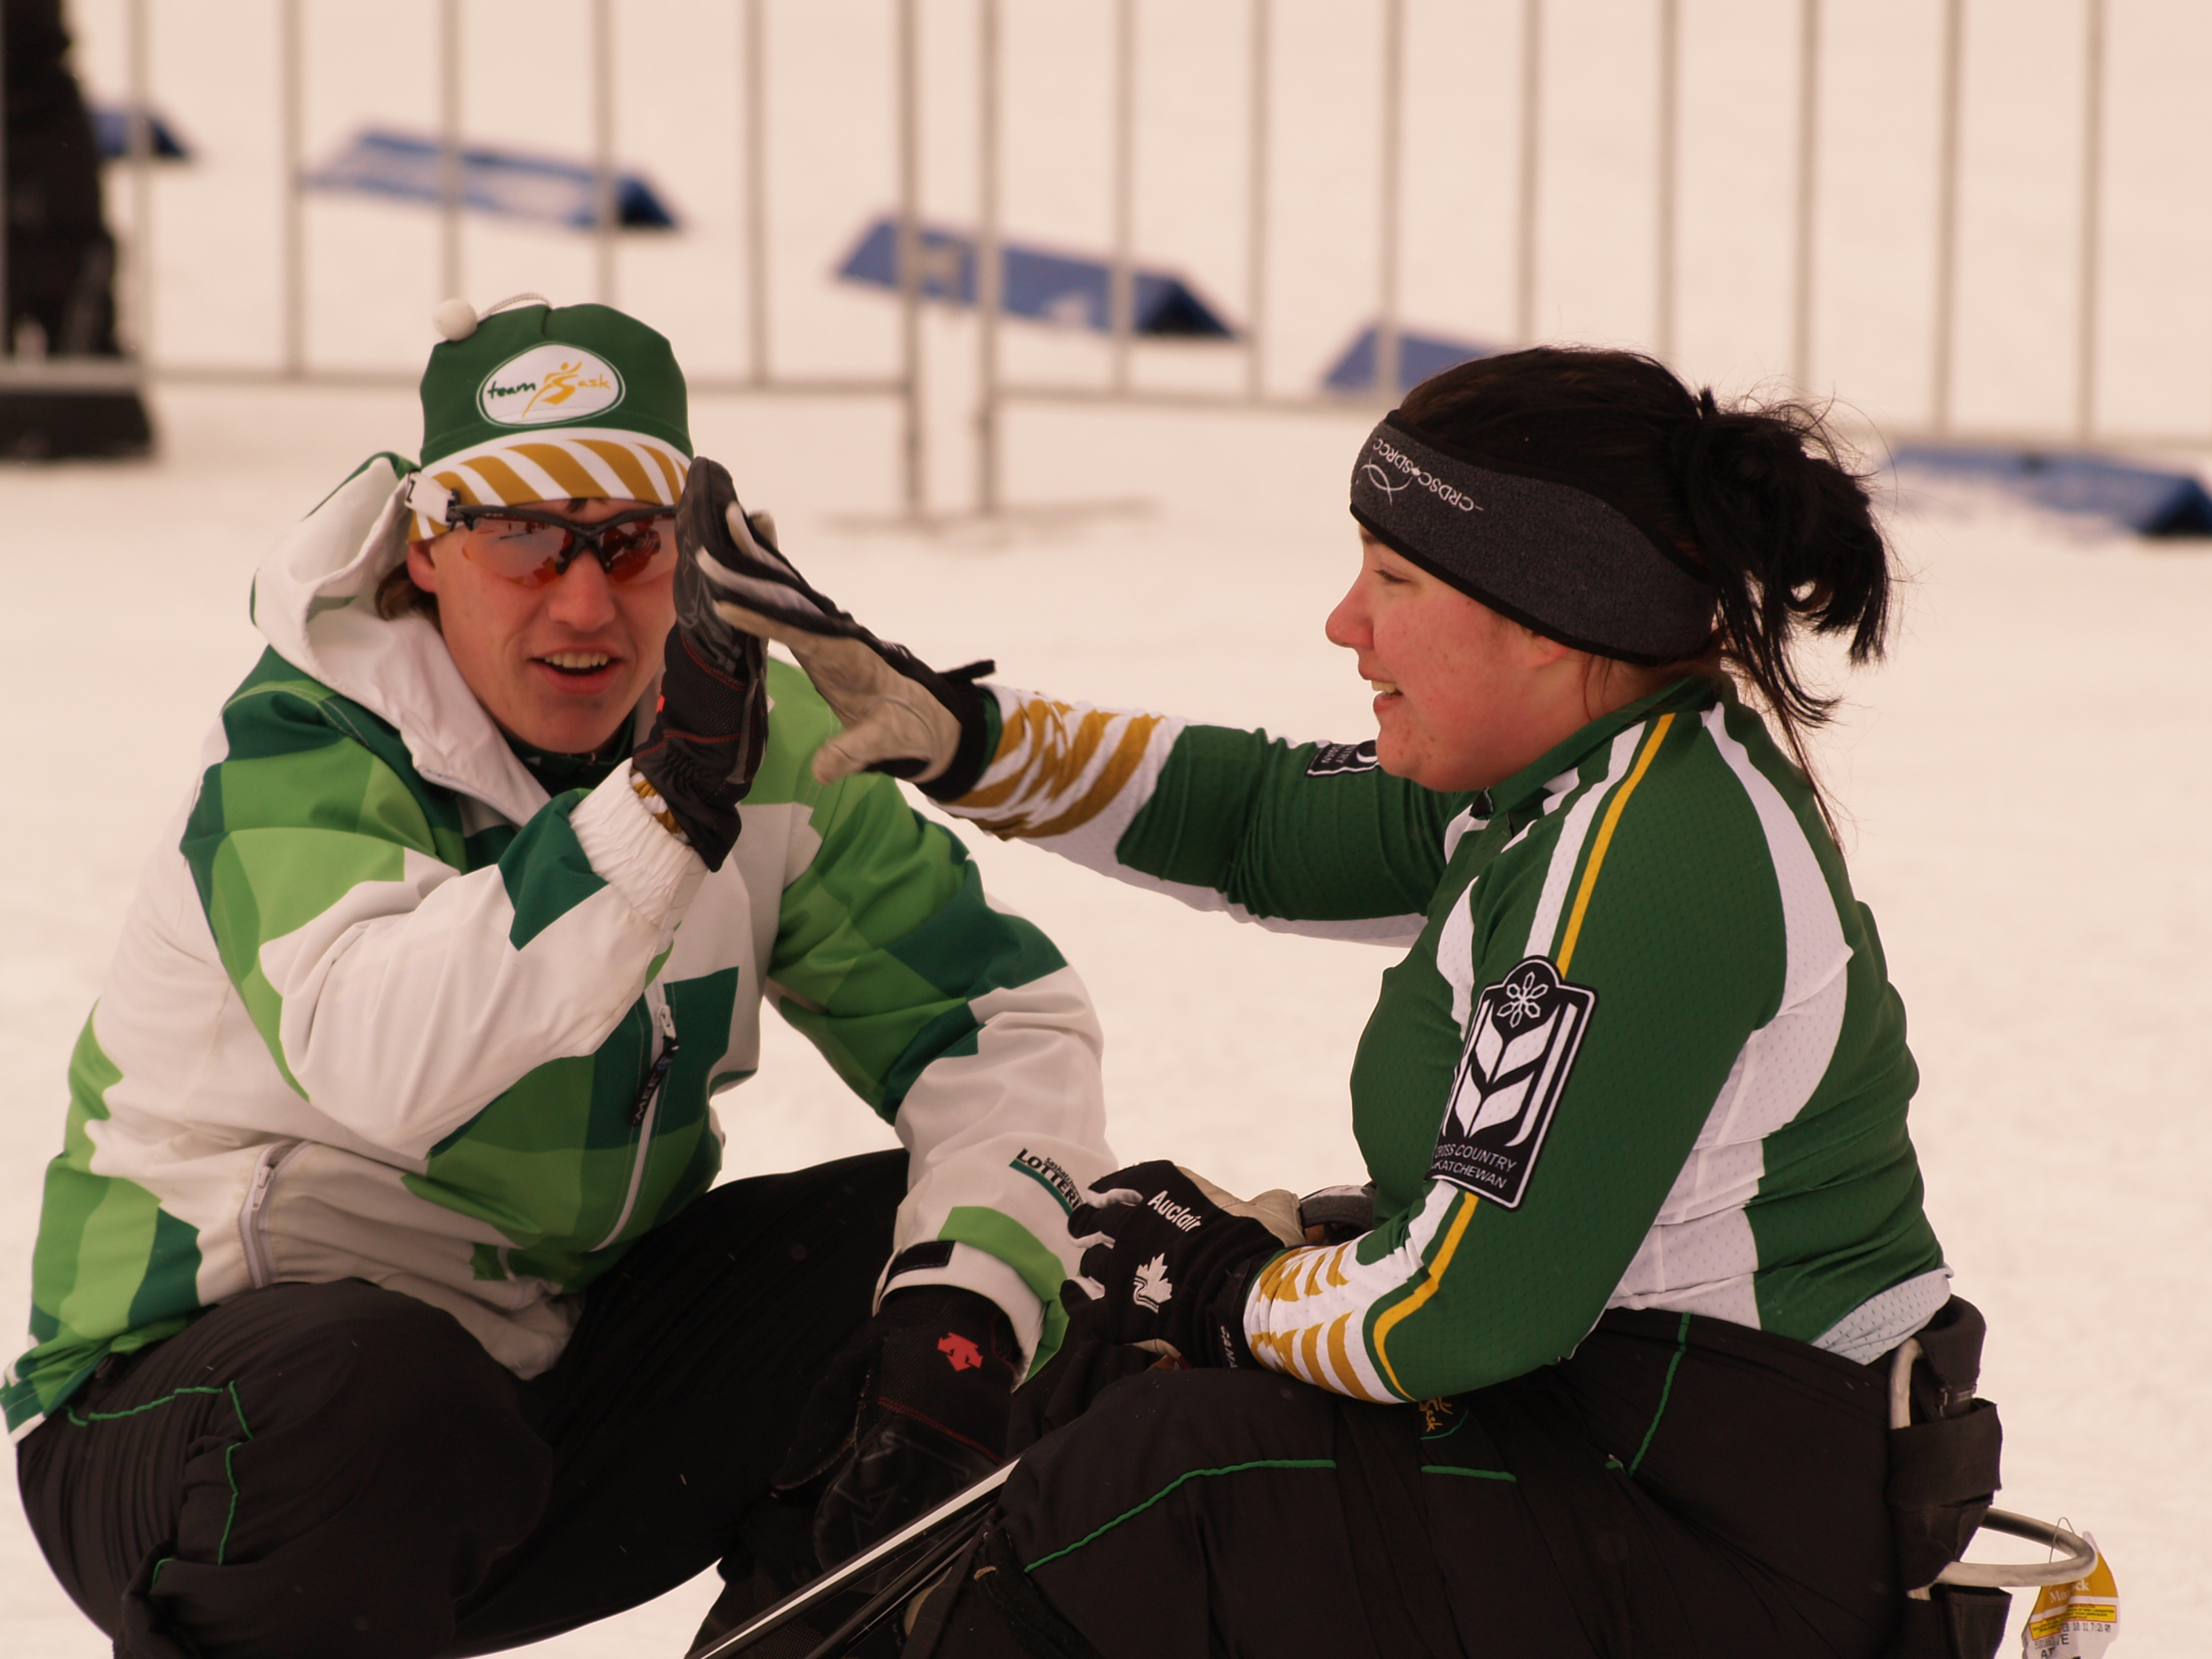 Kelsi_Paul_with_Nathan_Sedgewick_(coach)_silver_medal_sitski_sprint_2011_CWG_Martock_Nova_Scotia